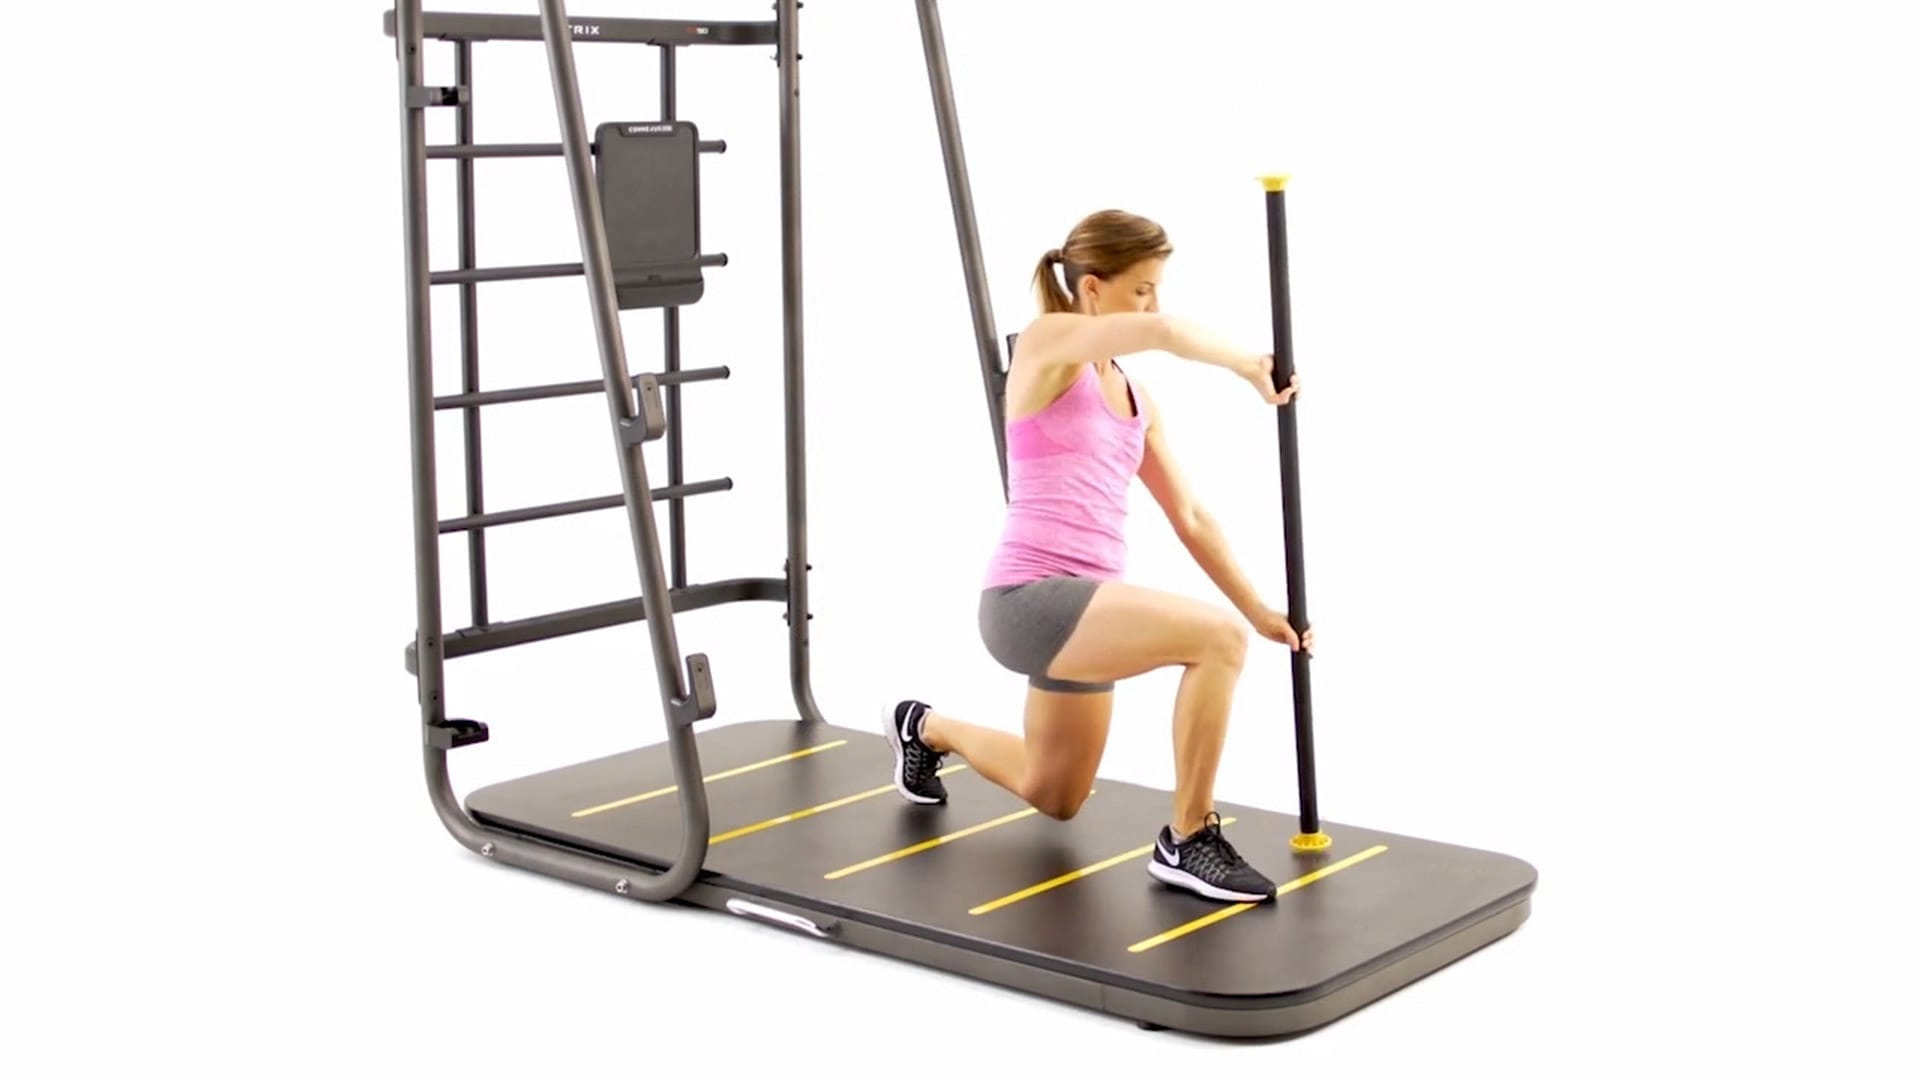 Connexus Home CXR50 - Functional | Matrix Fitness - World